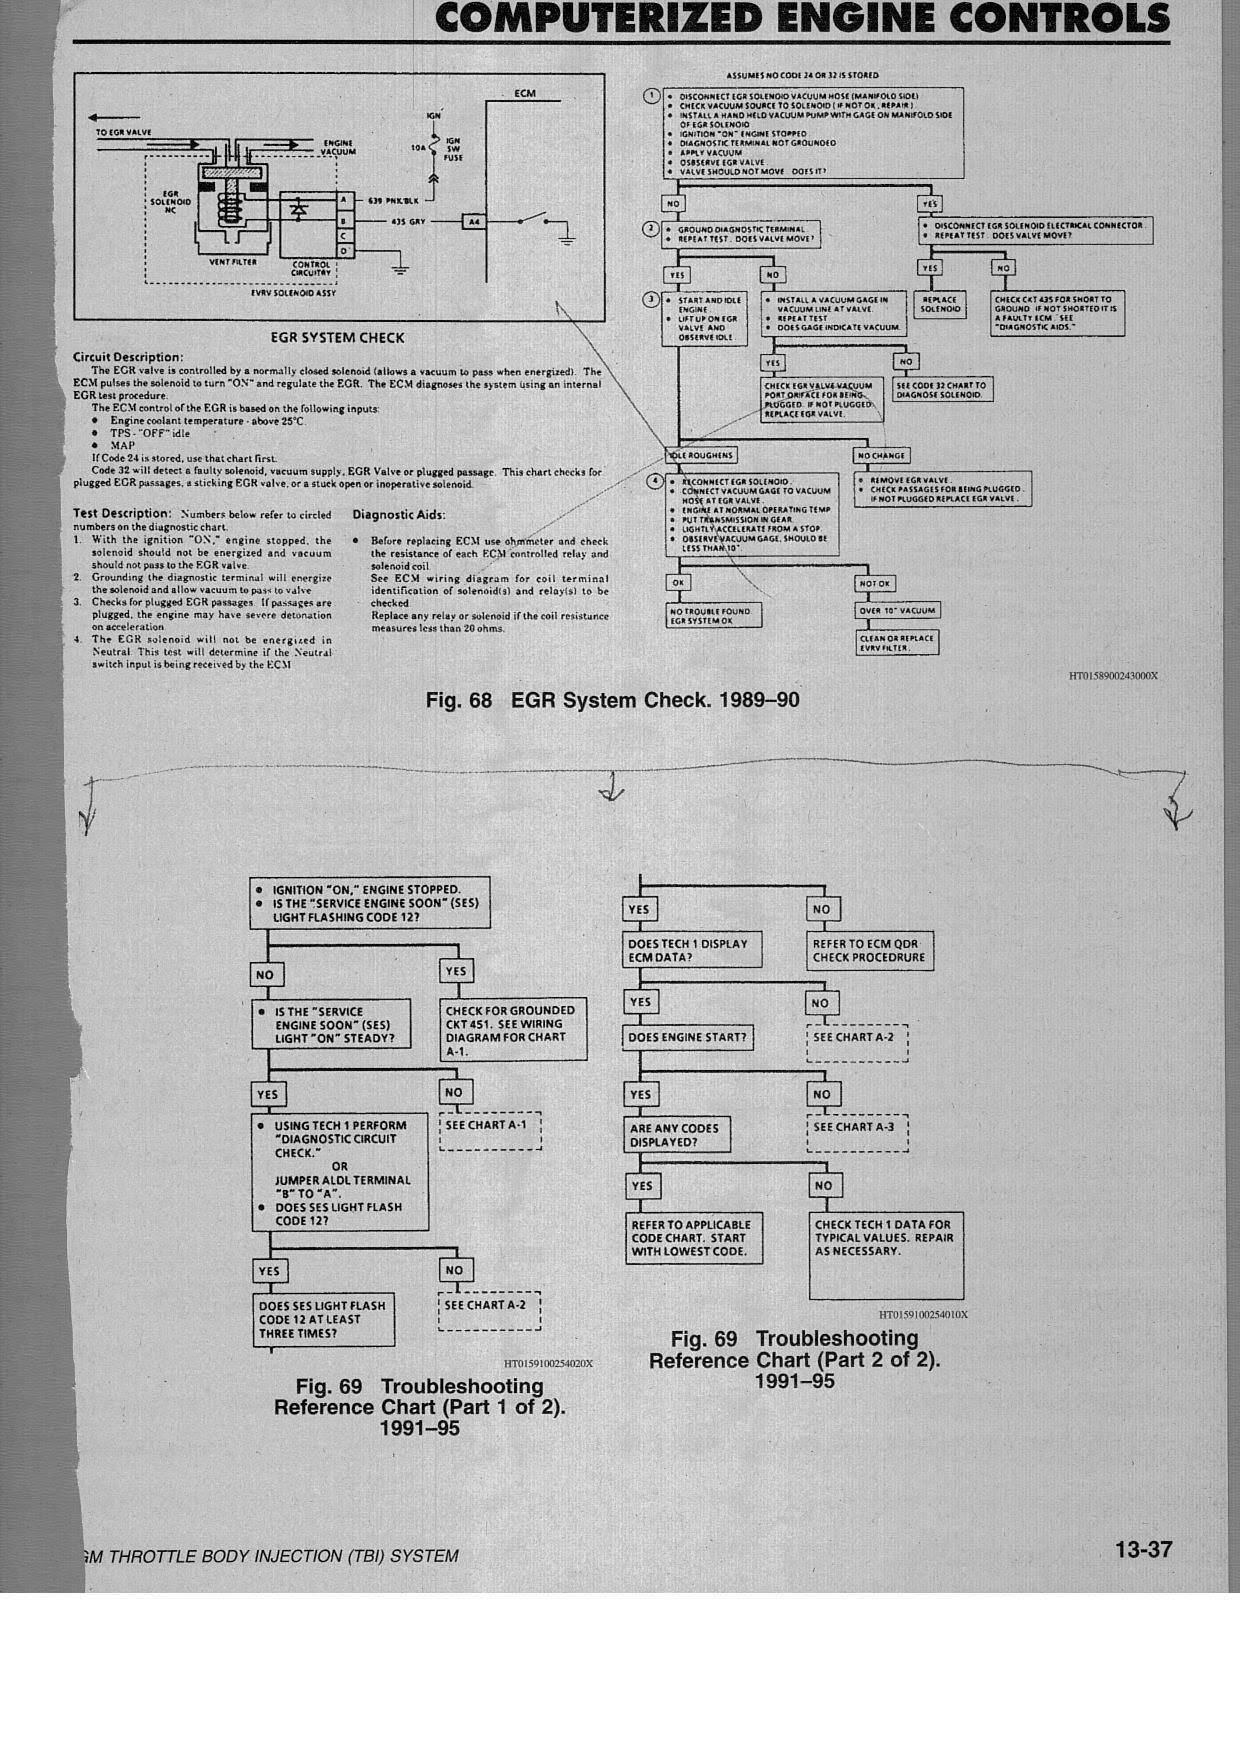 Diagram 1983 Chevy G30 Wiring Diagram Full Version Hd Quality Wiring Diagram Tsou As4a Fr